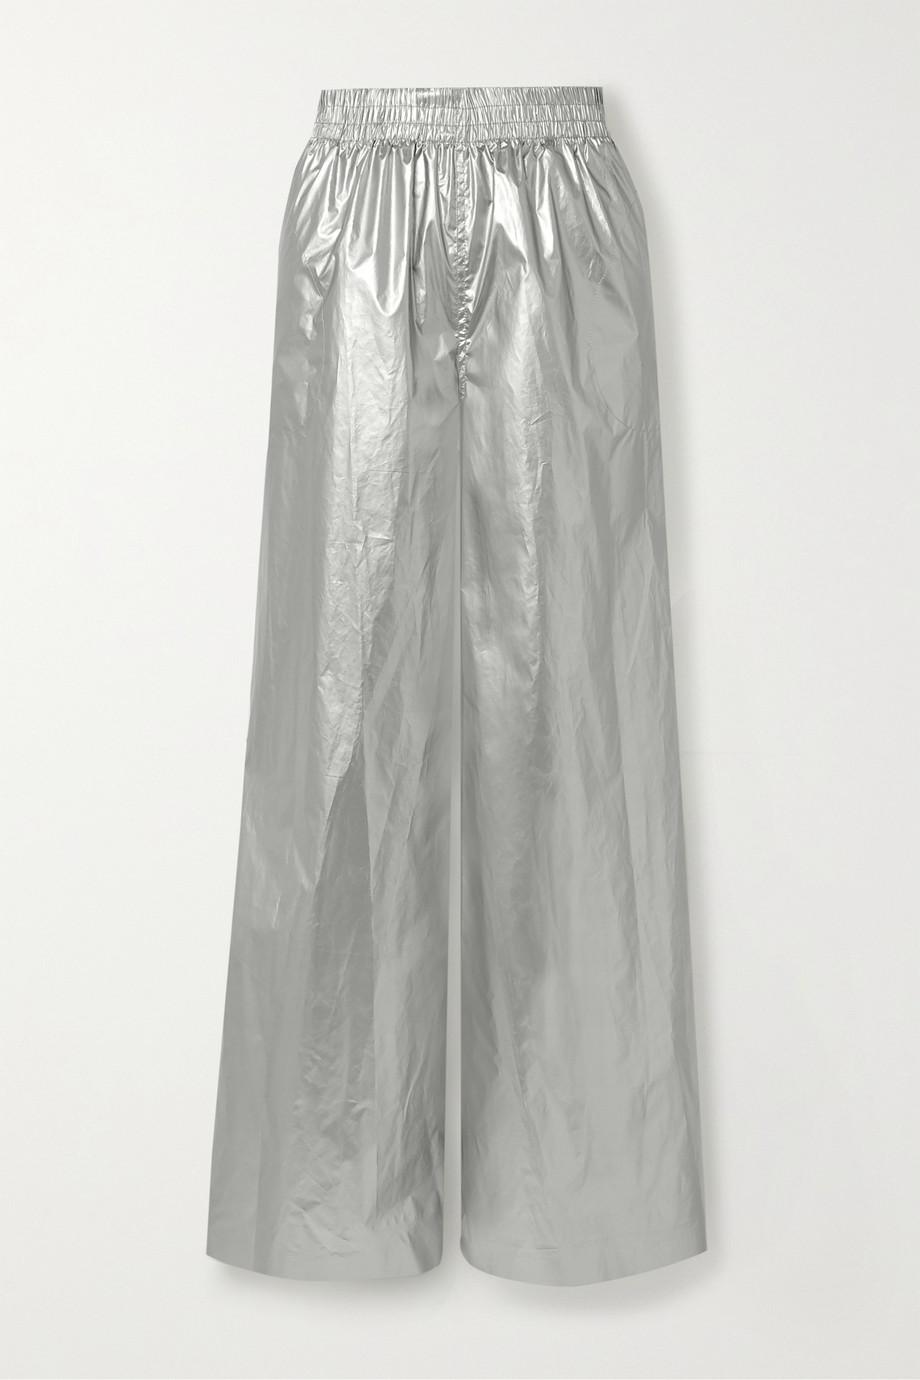 Norma Kamali Pantalon large en tissu technique métallisé Boyfriend Elephant